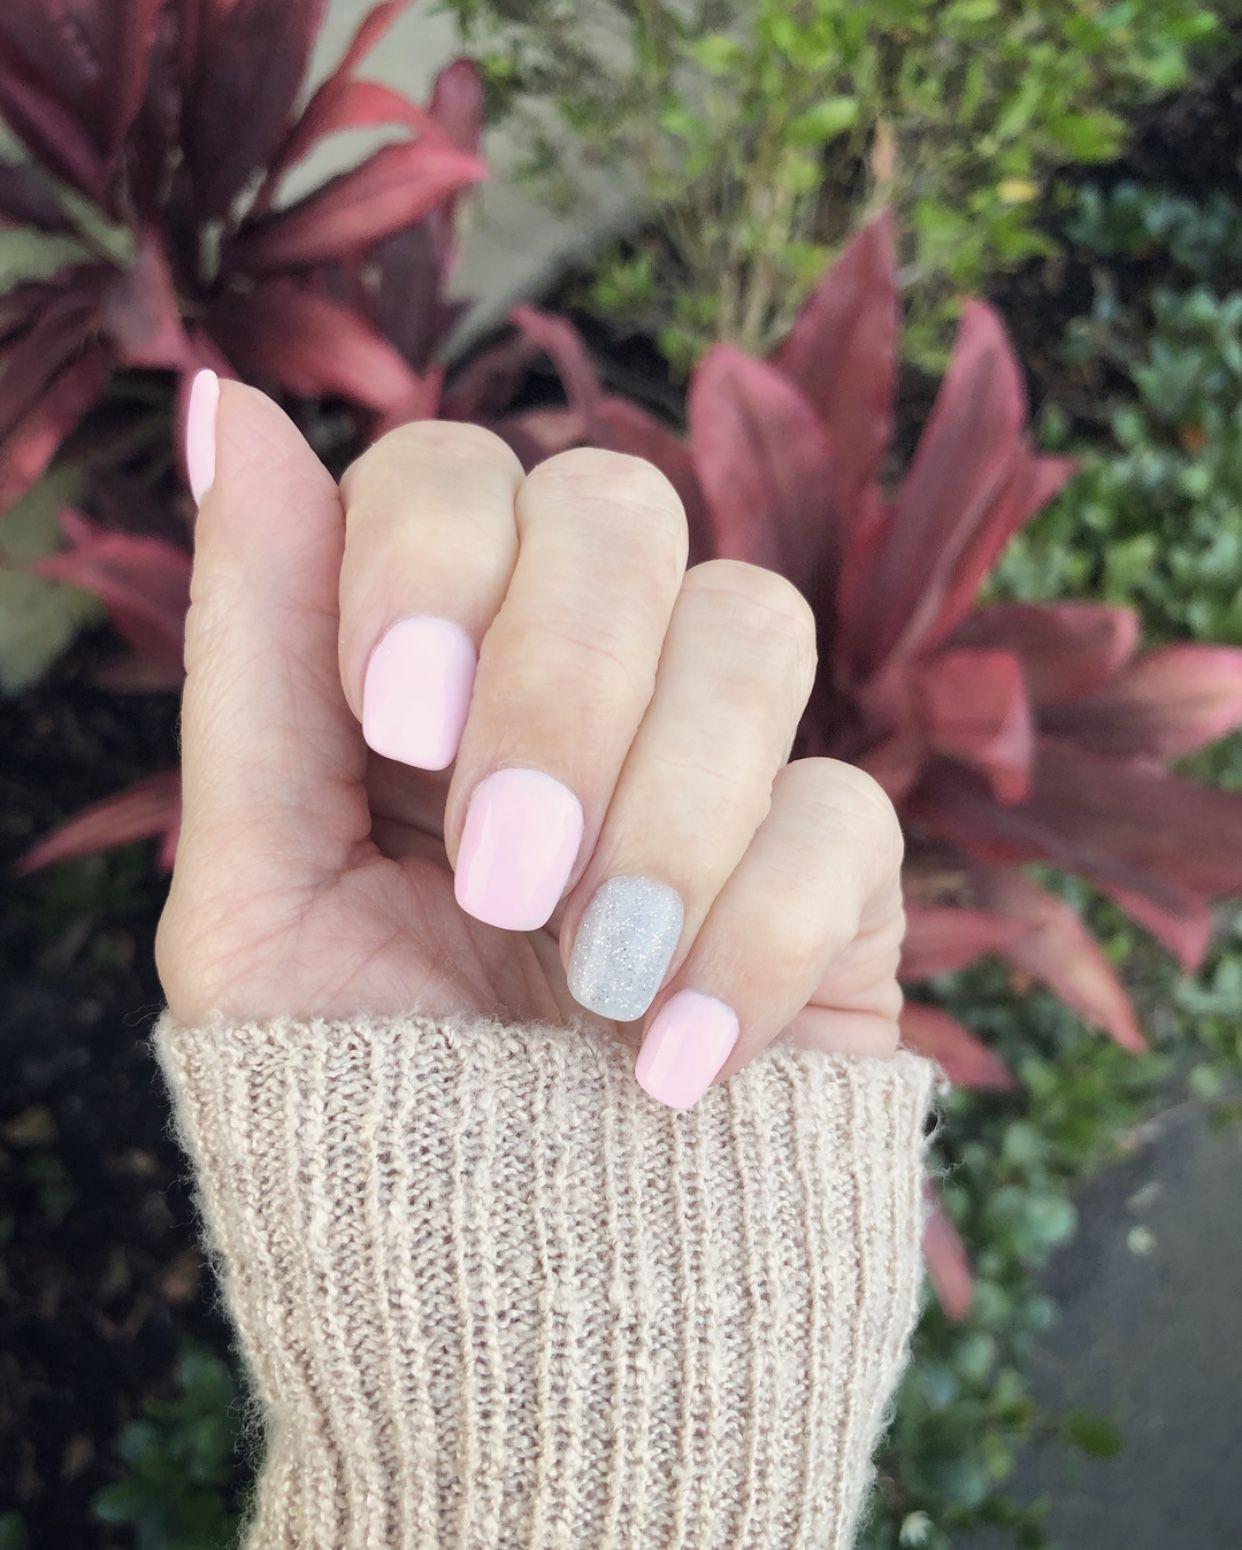 Kiara Sky The Simple Life And Nexgen Switzerland Nexgen Nails Manicure Pinknails Colorful Nail Designs Powder Nails Nail Colors